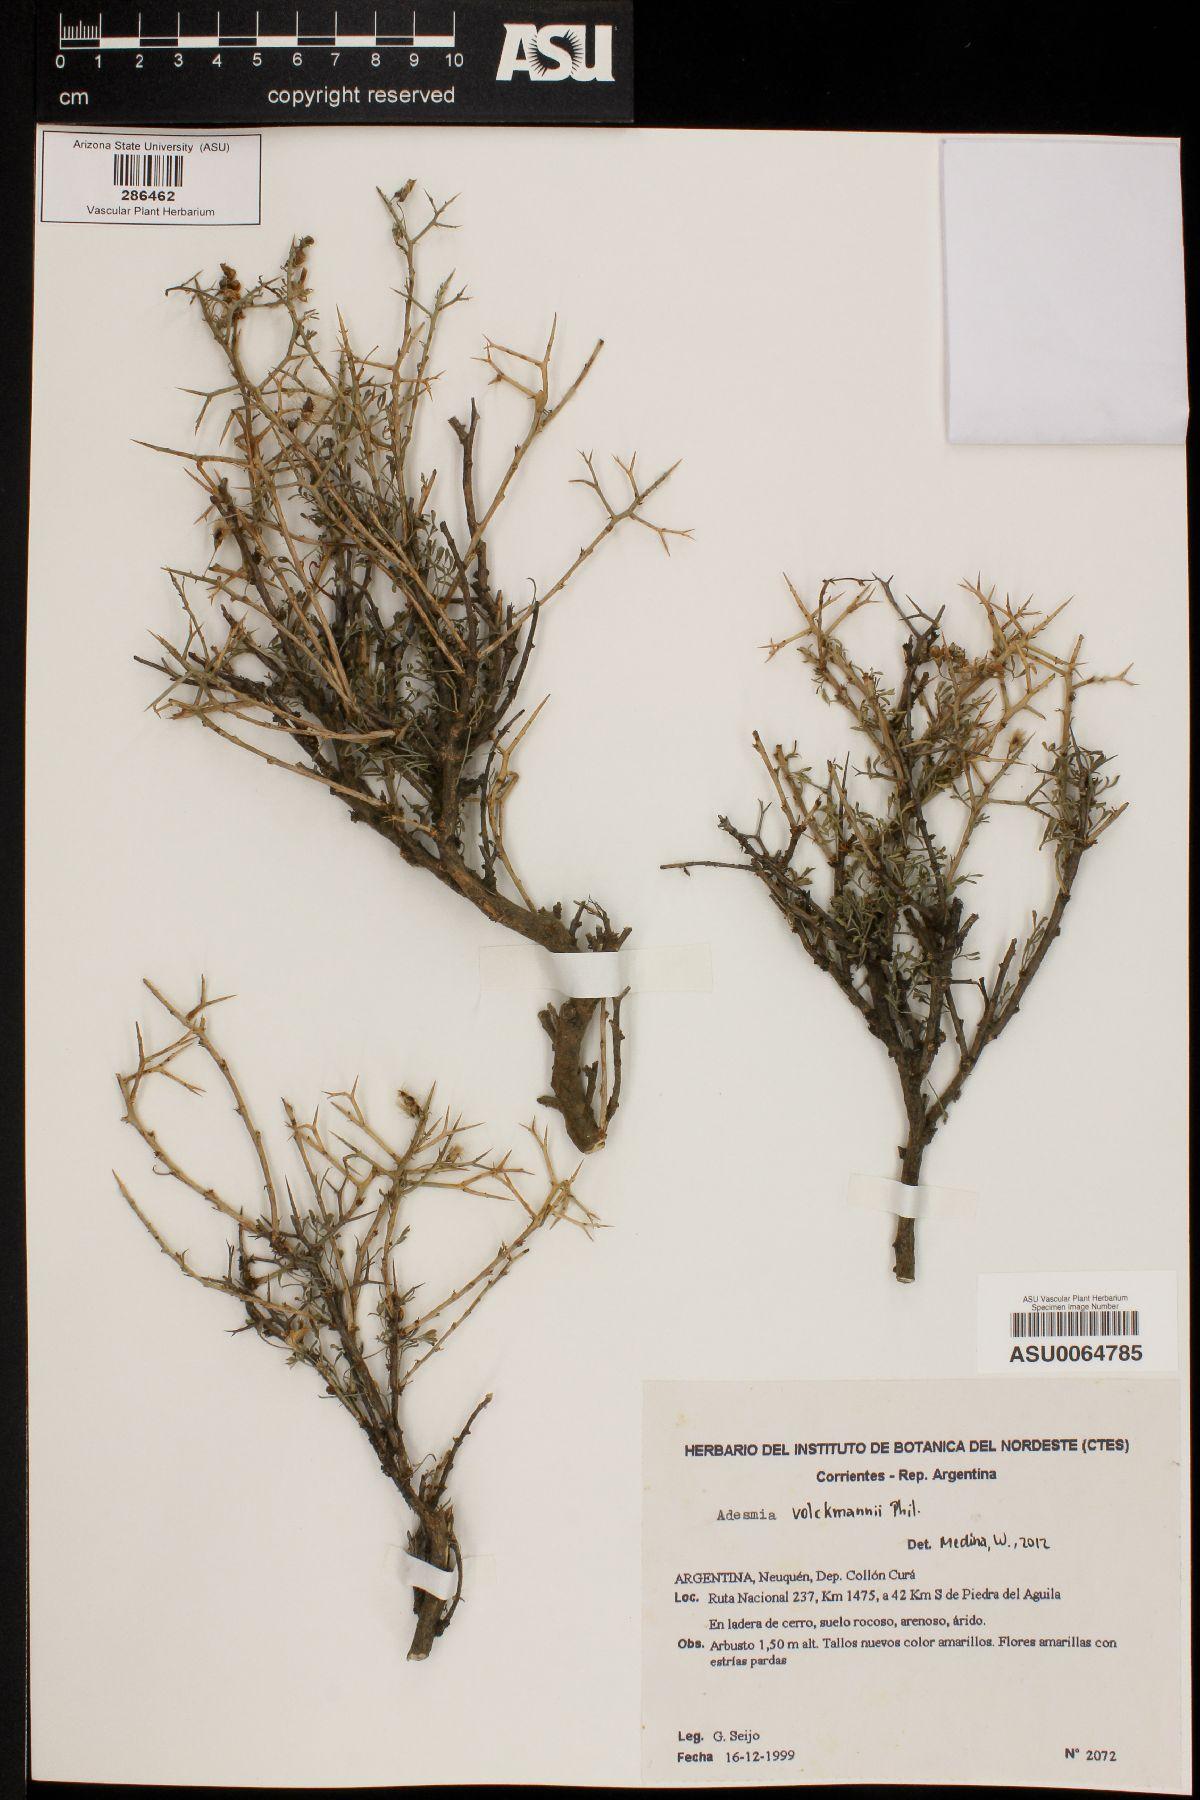 Adesmia volckmannii image